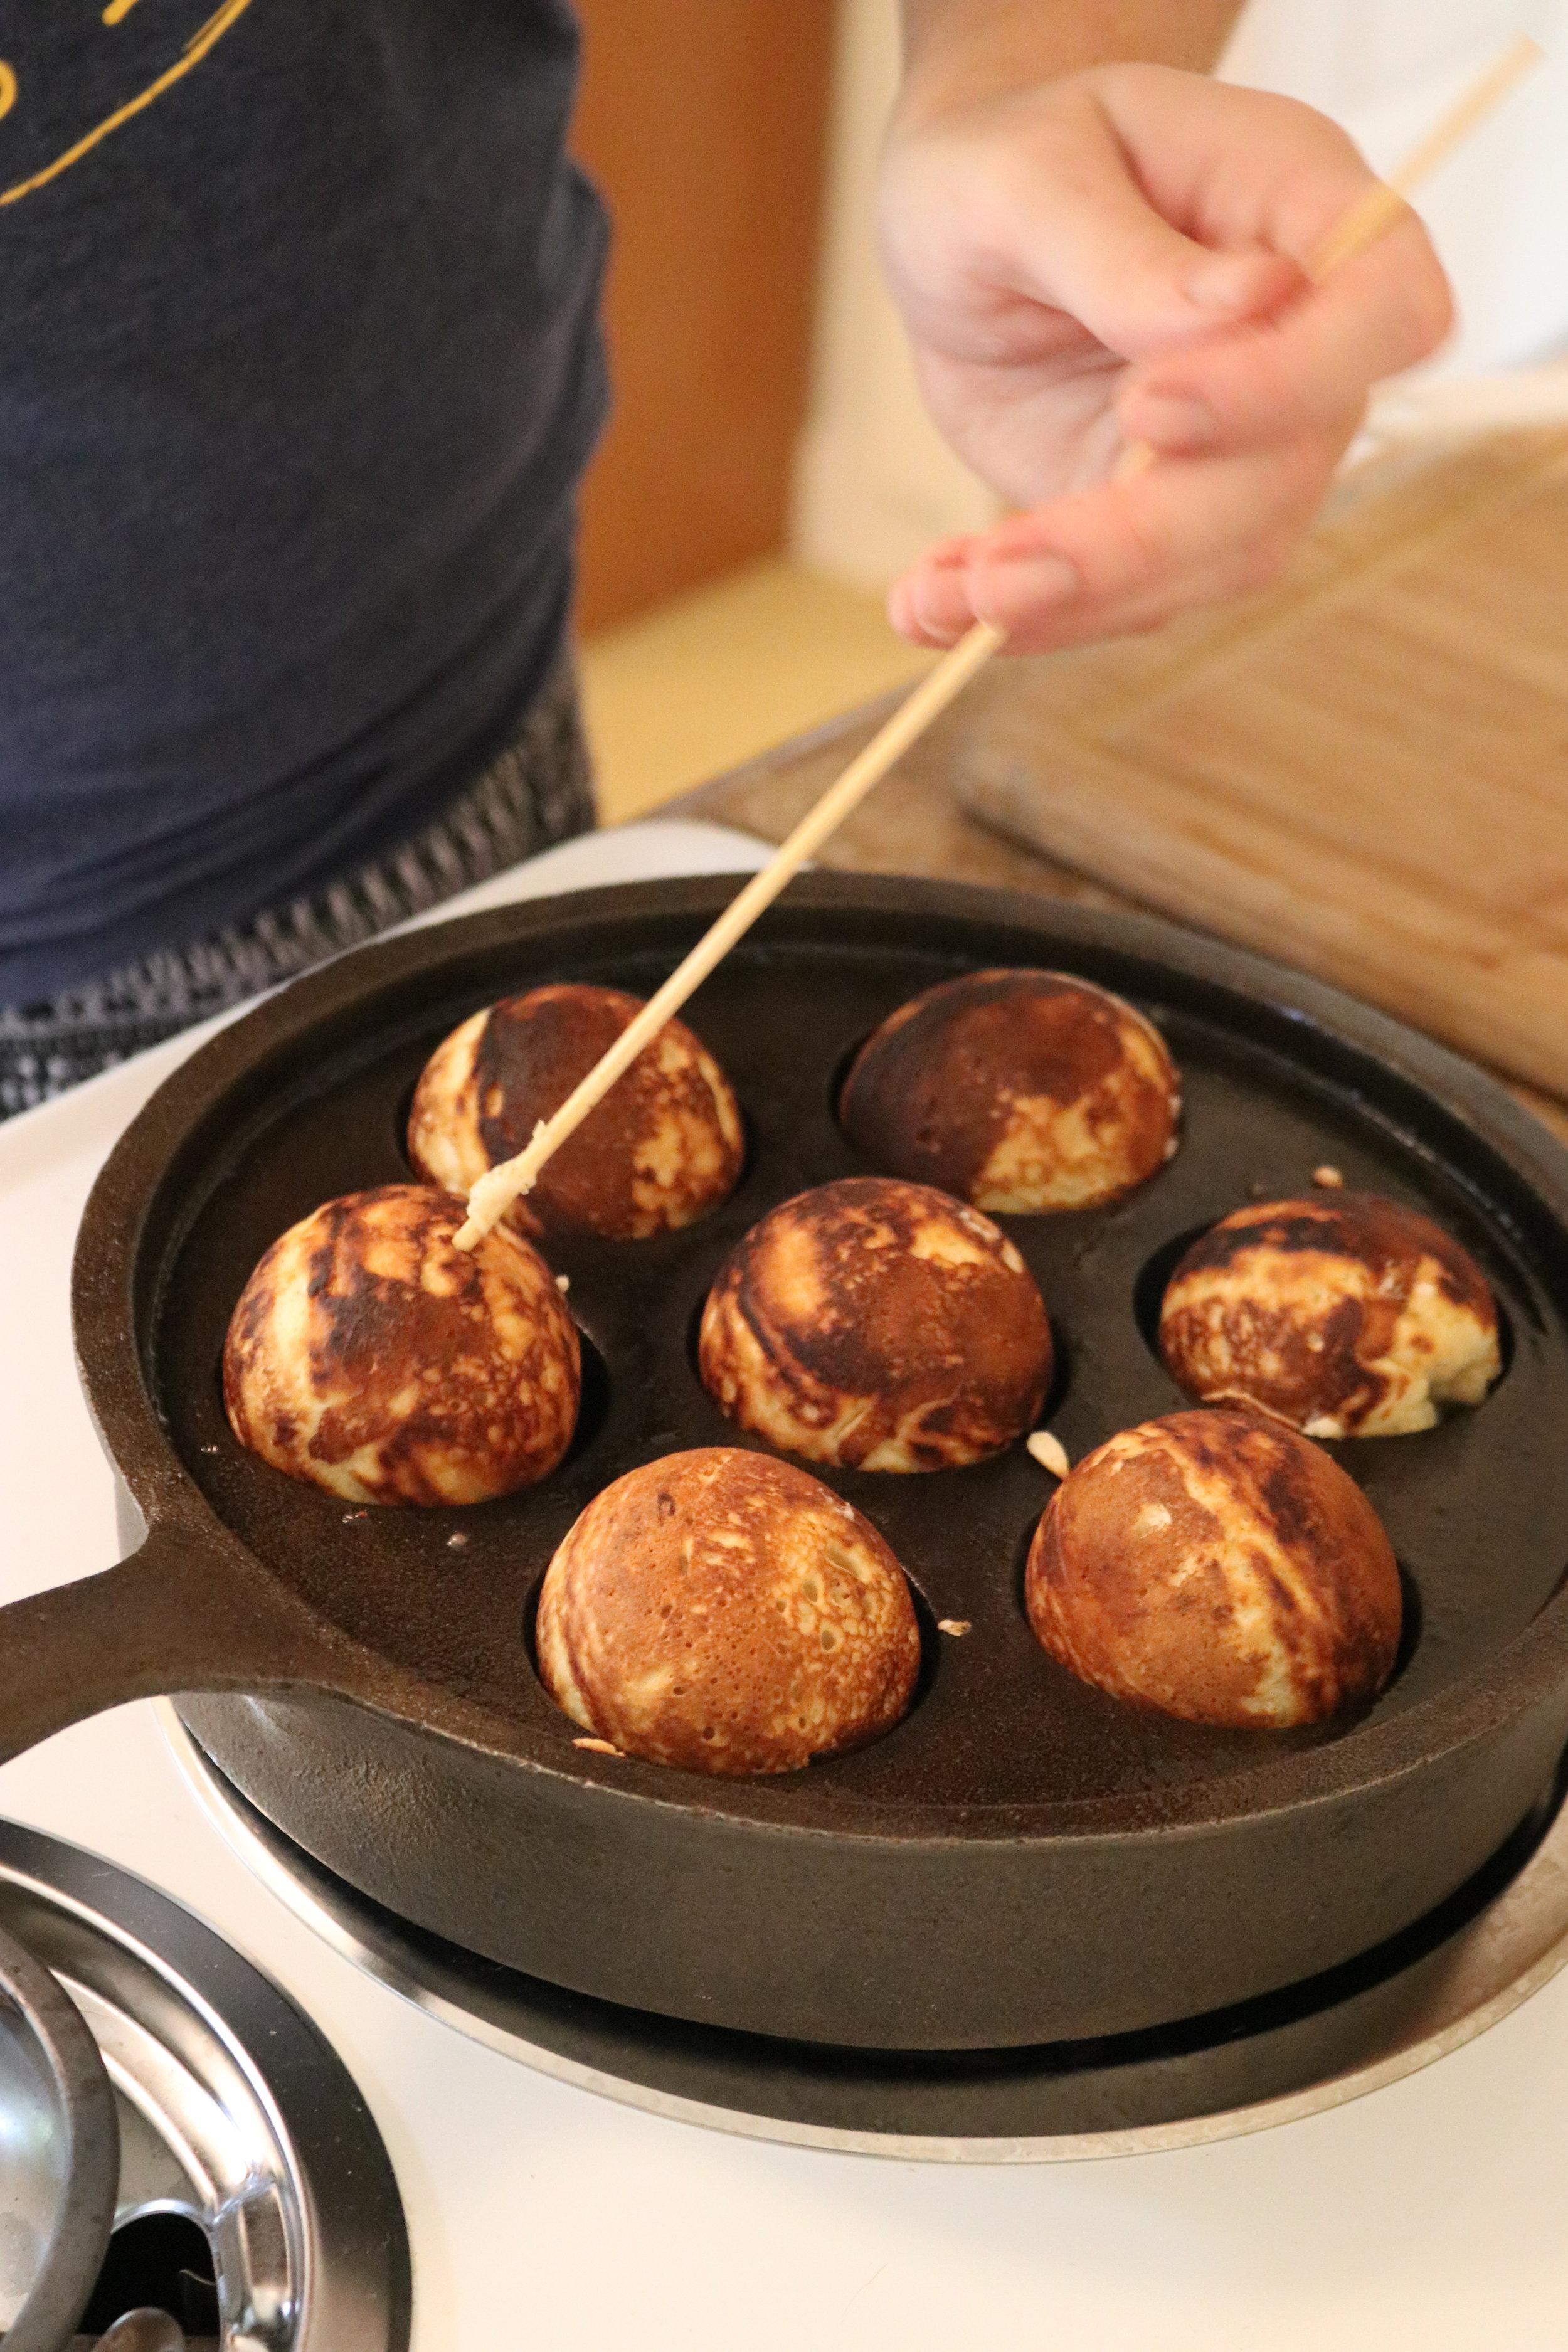 Aebleskiver - little, round, Scandinavian pancakes